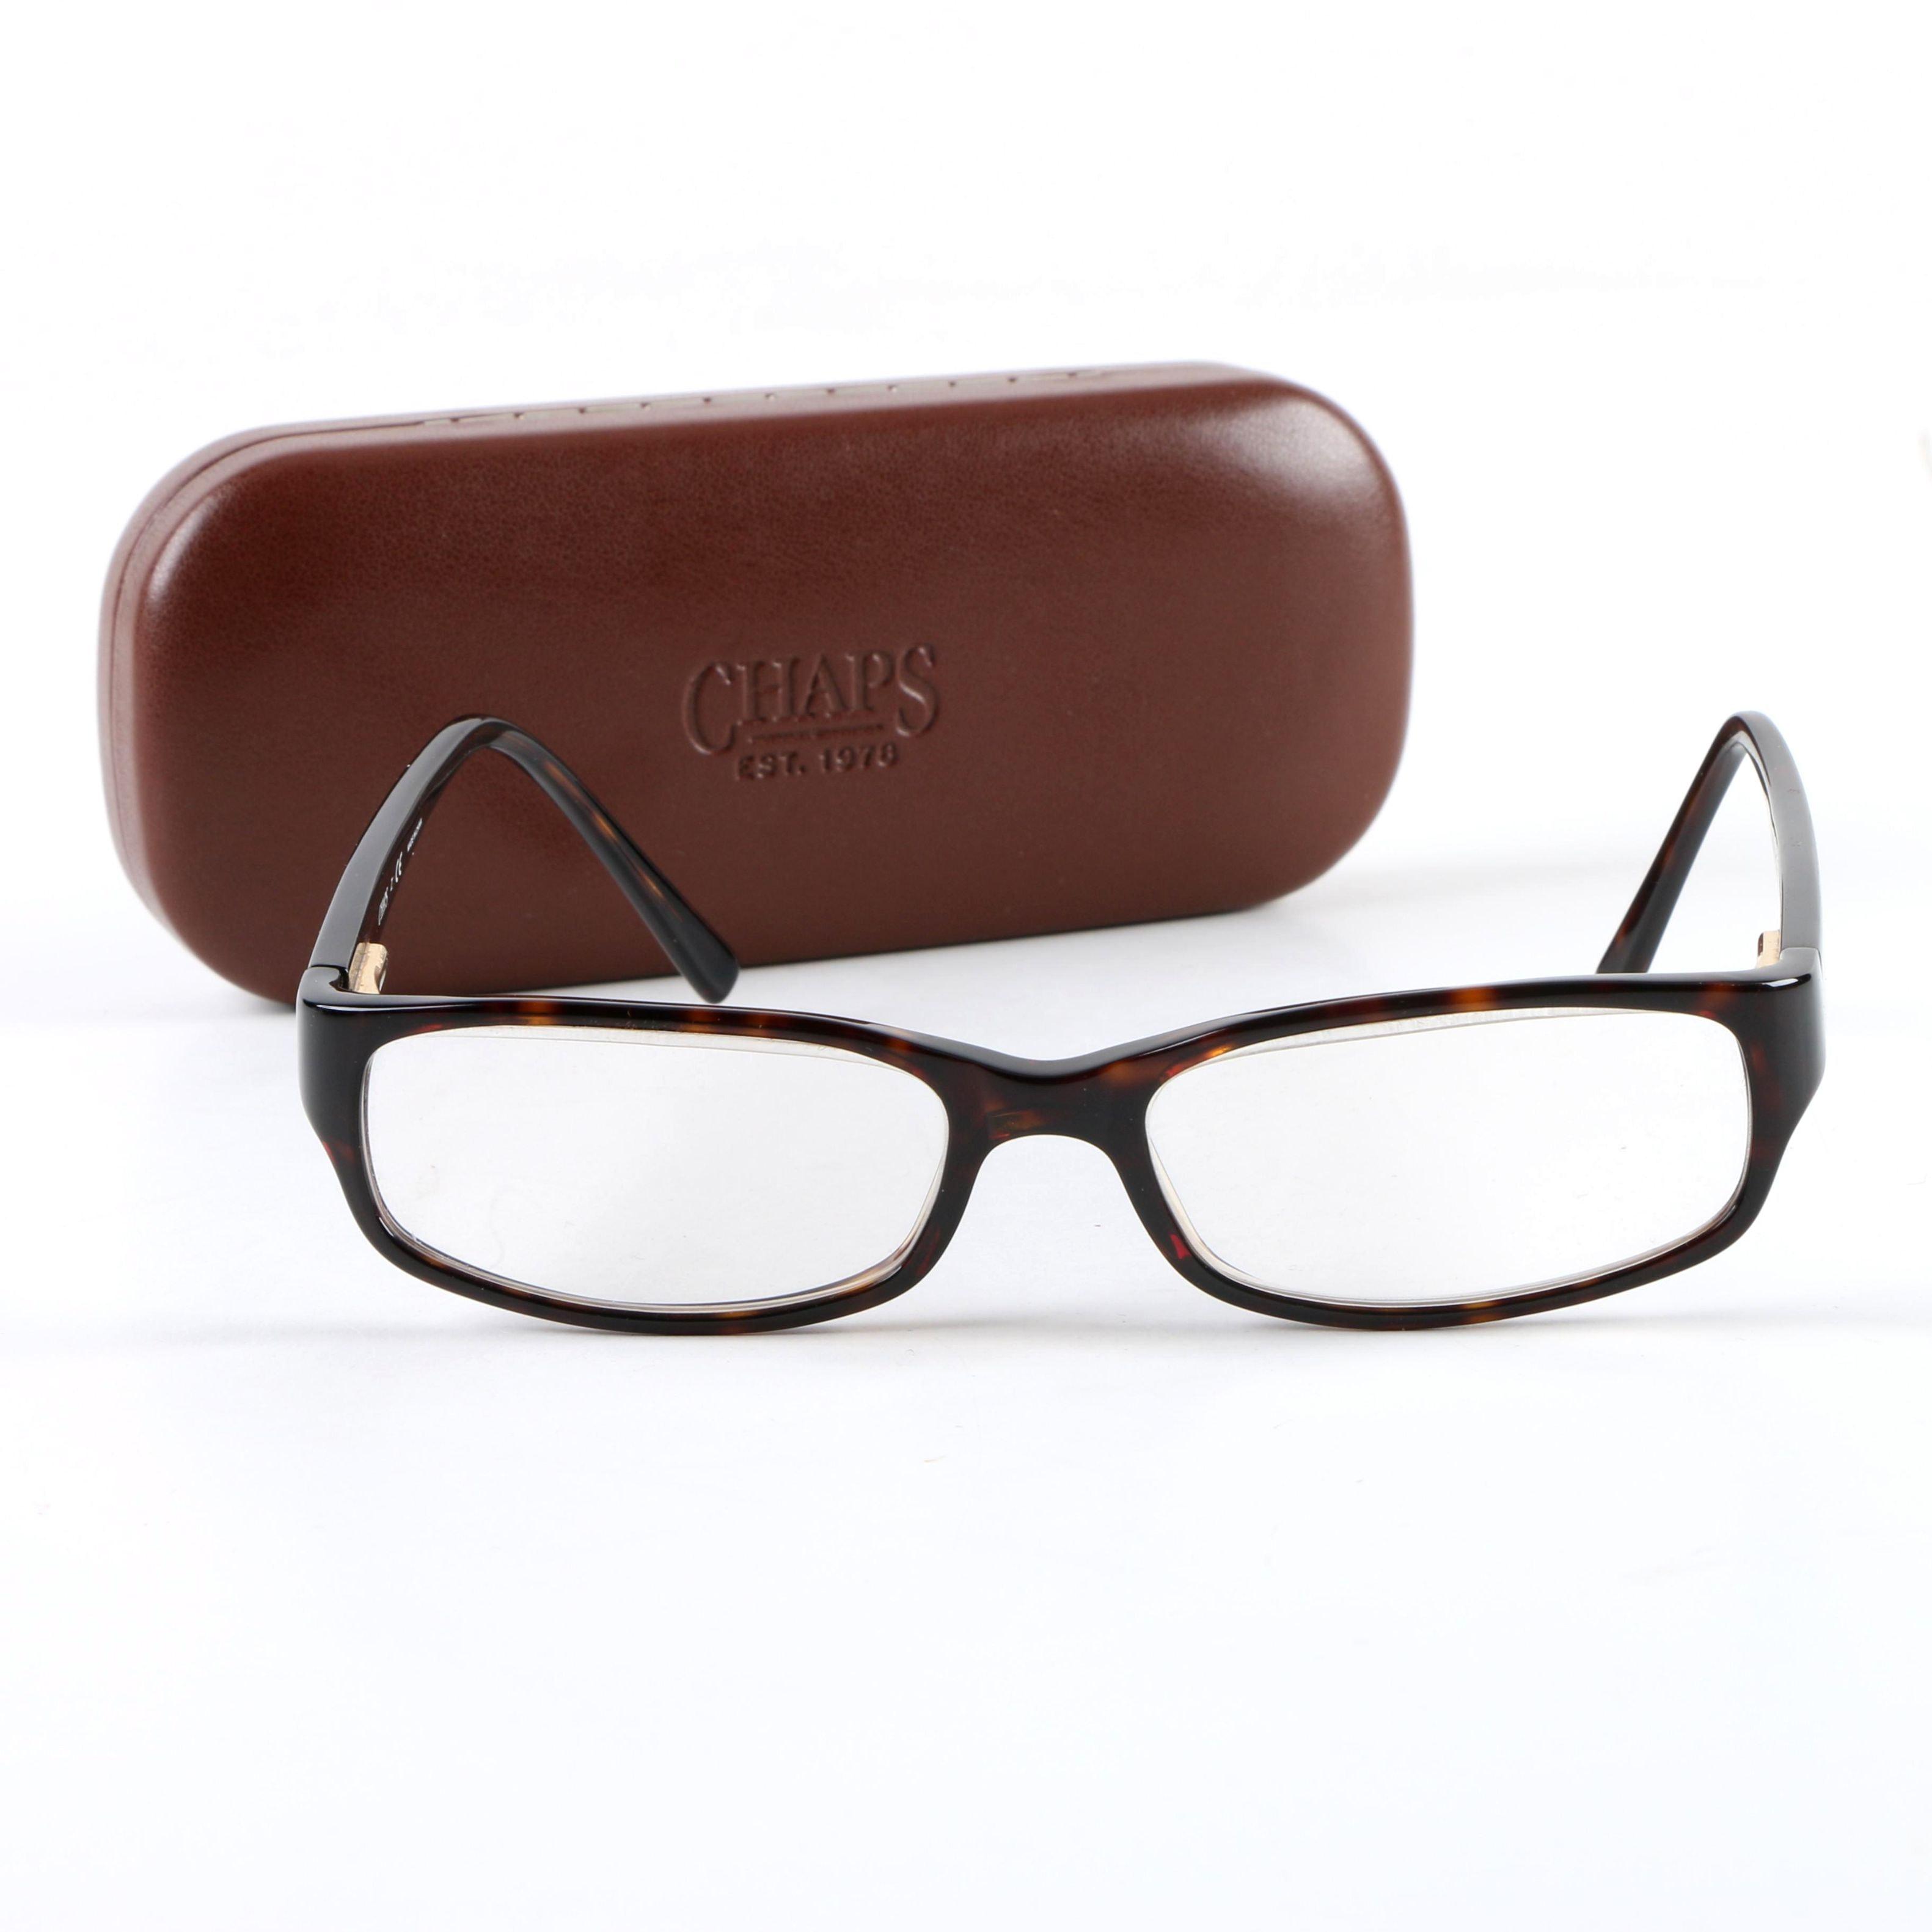 Chaps Tortoiseshell Style Prescription Eyeglasses with Case